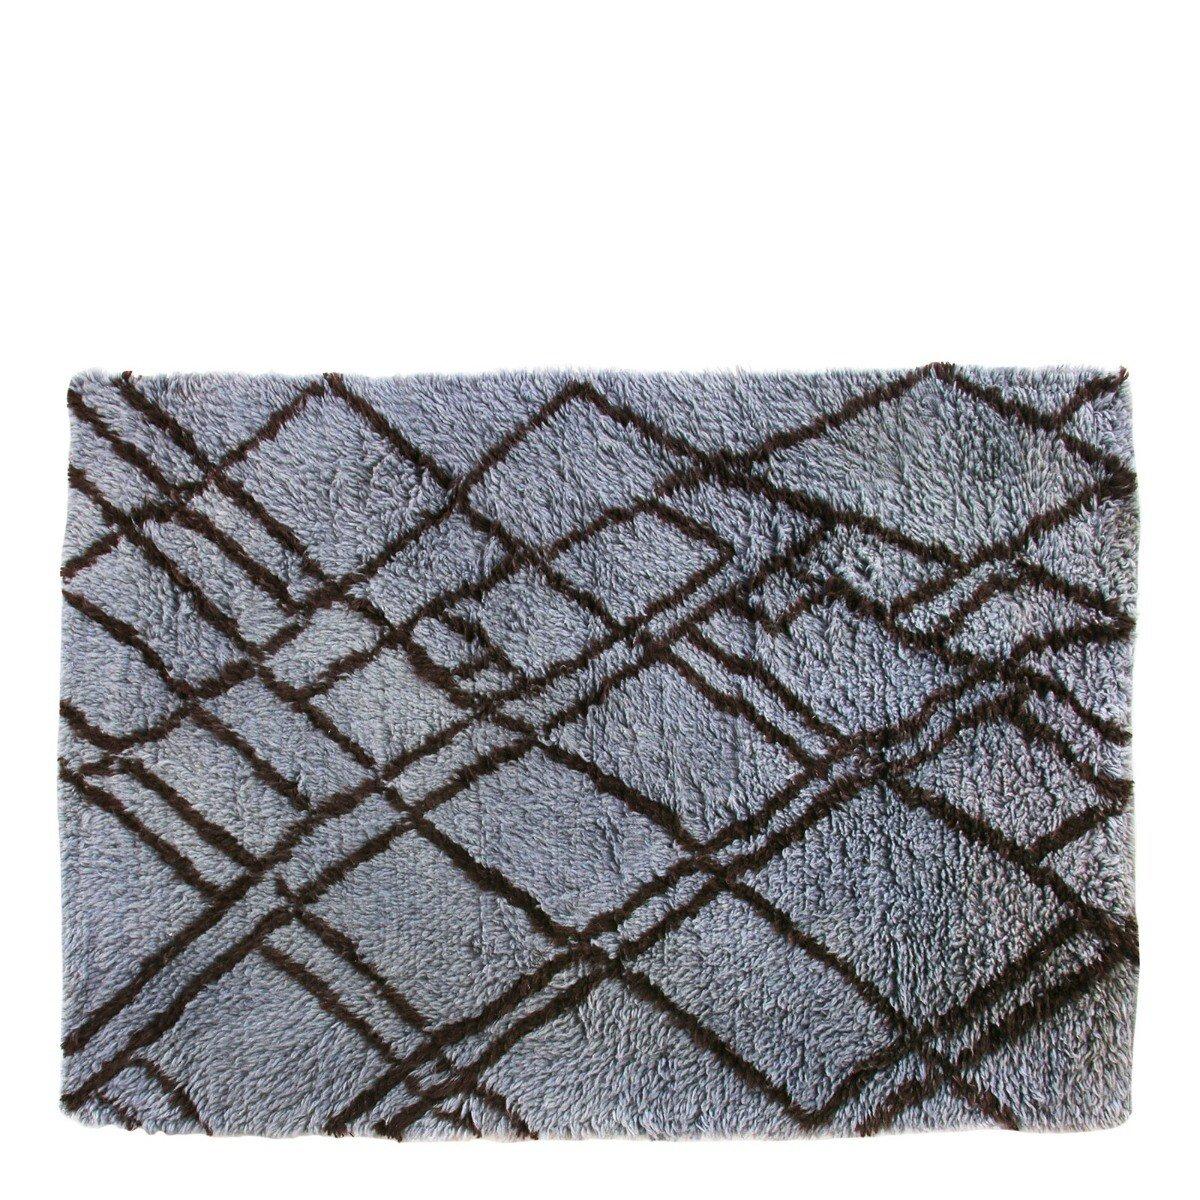 HKliving vloerkleed berber wol grijs blauw 180 x 280